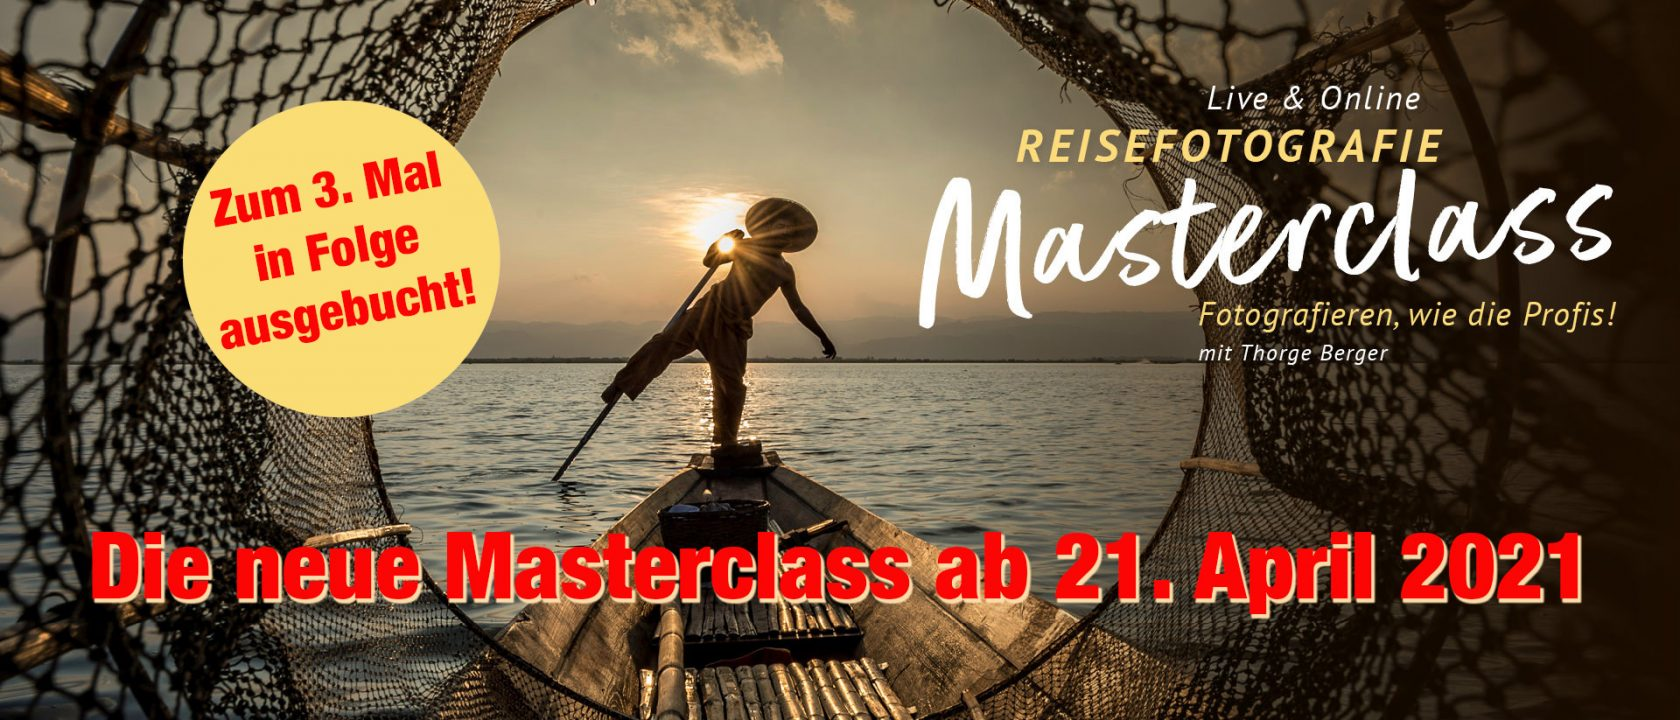 Masterclass Reisefotografie - April 2021 - Ausgebucht!